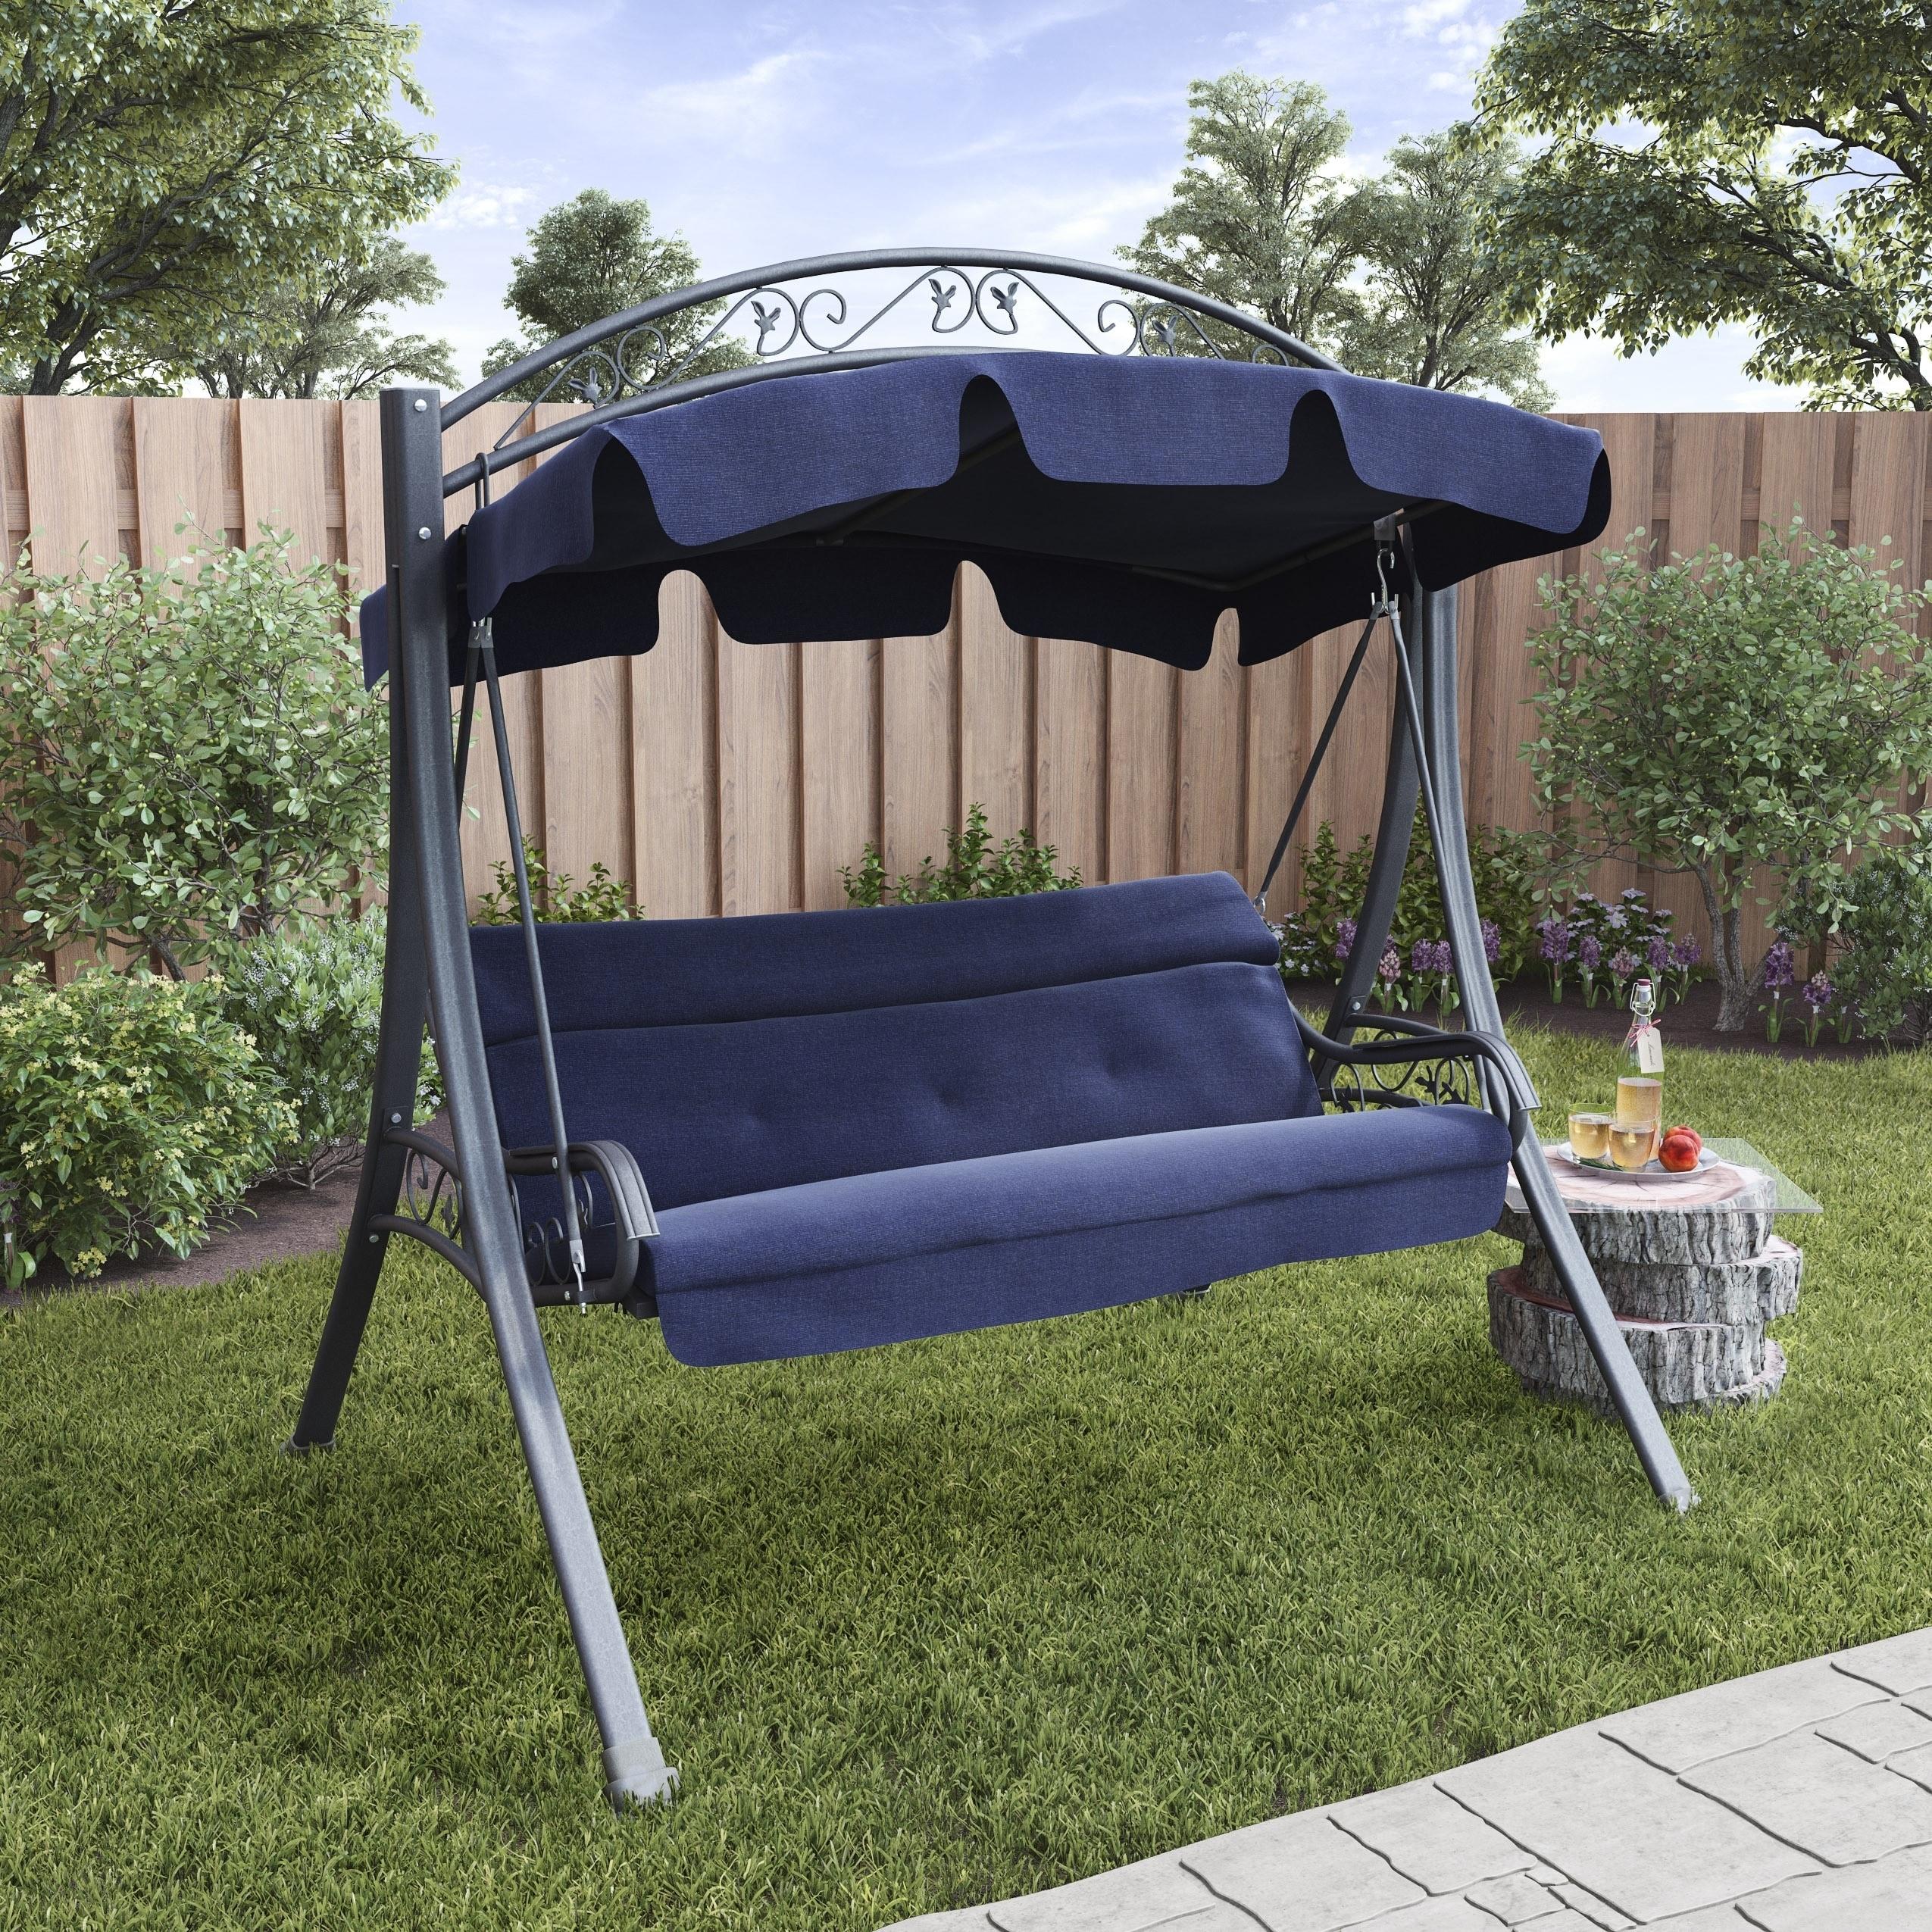 outdoor with porch patio seats swing furniture swings wooden garden chairs regarding fun canopy